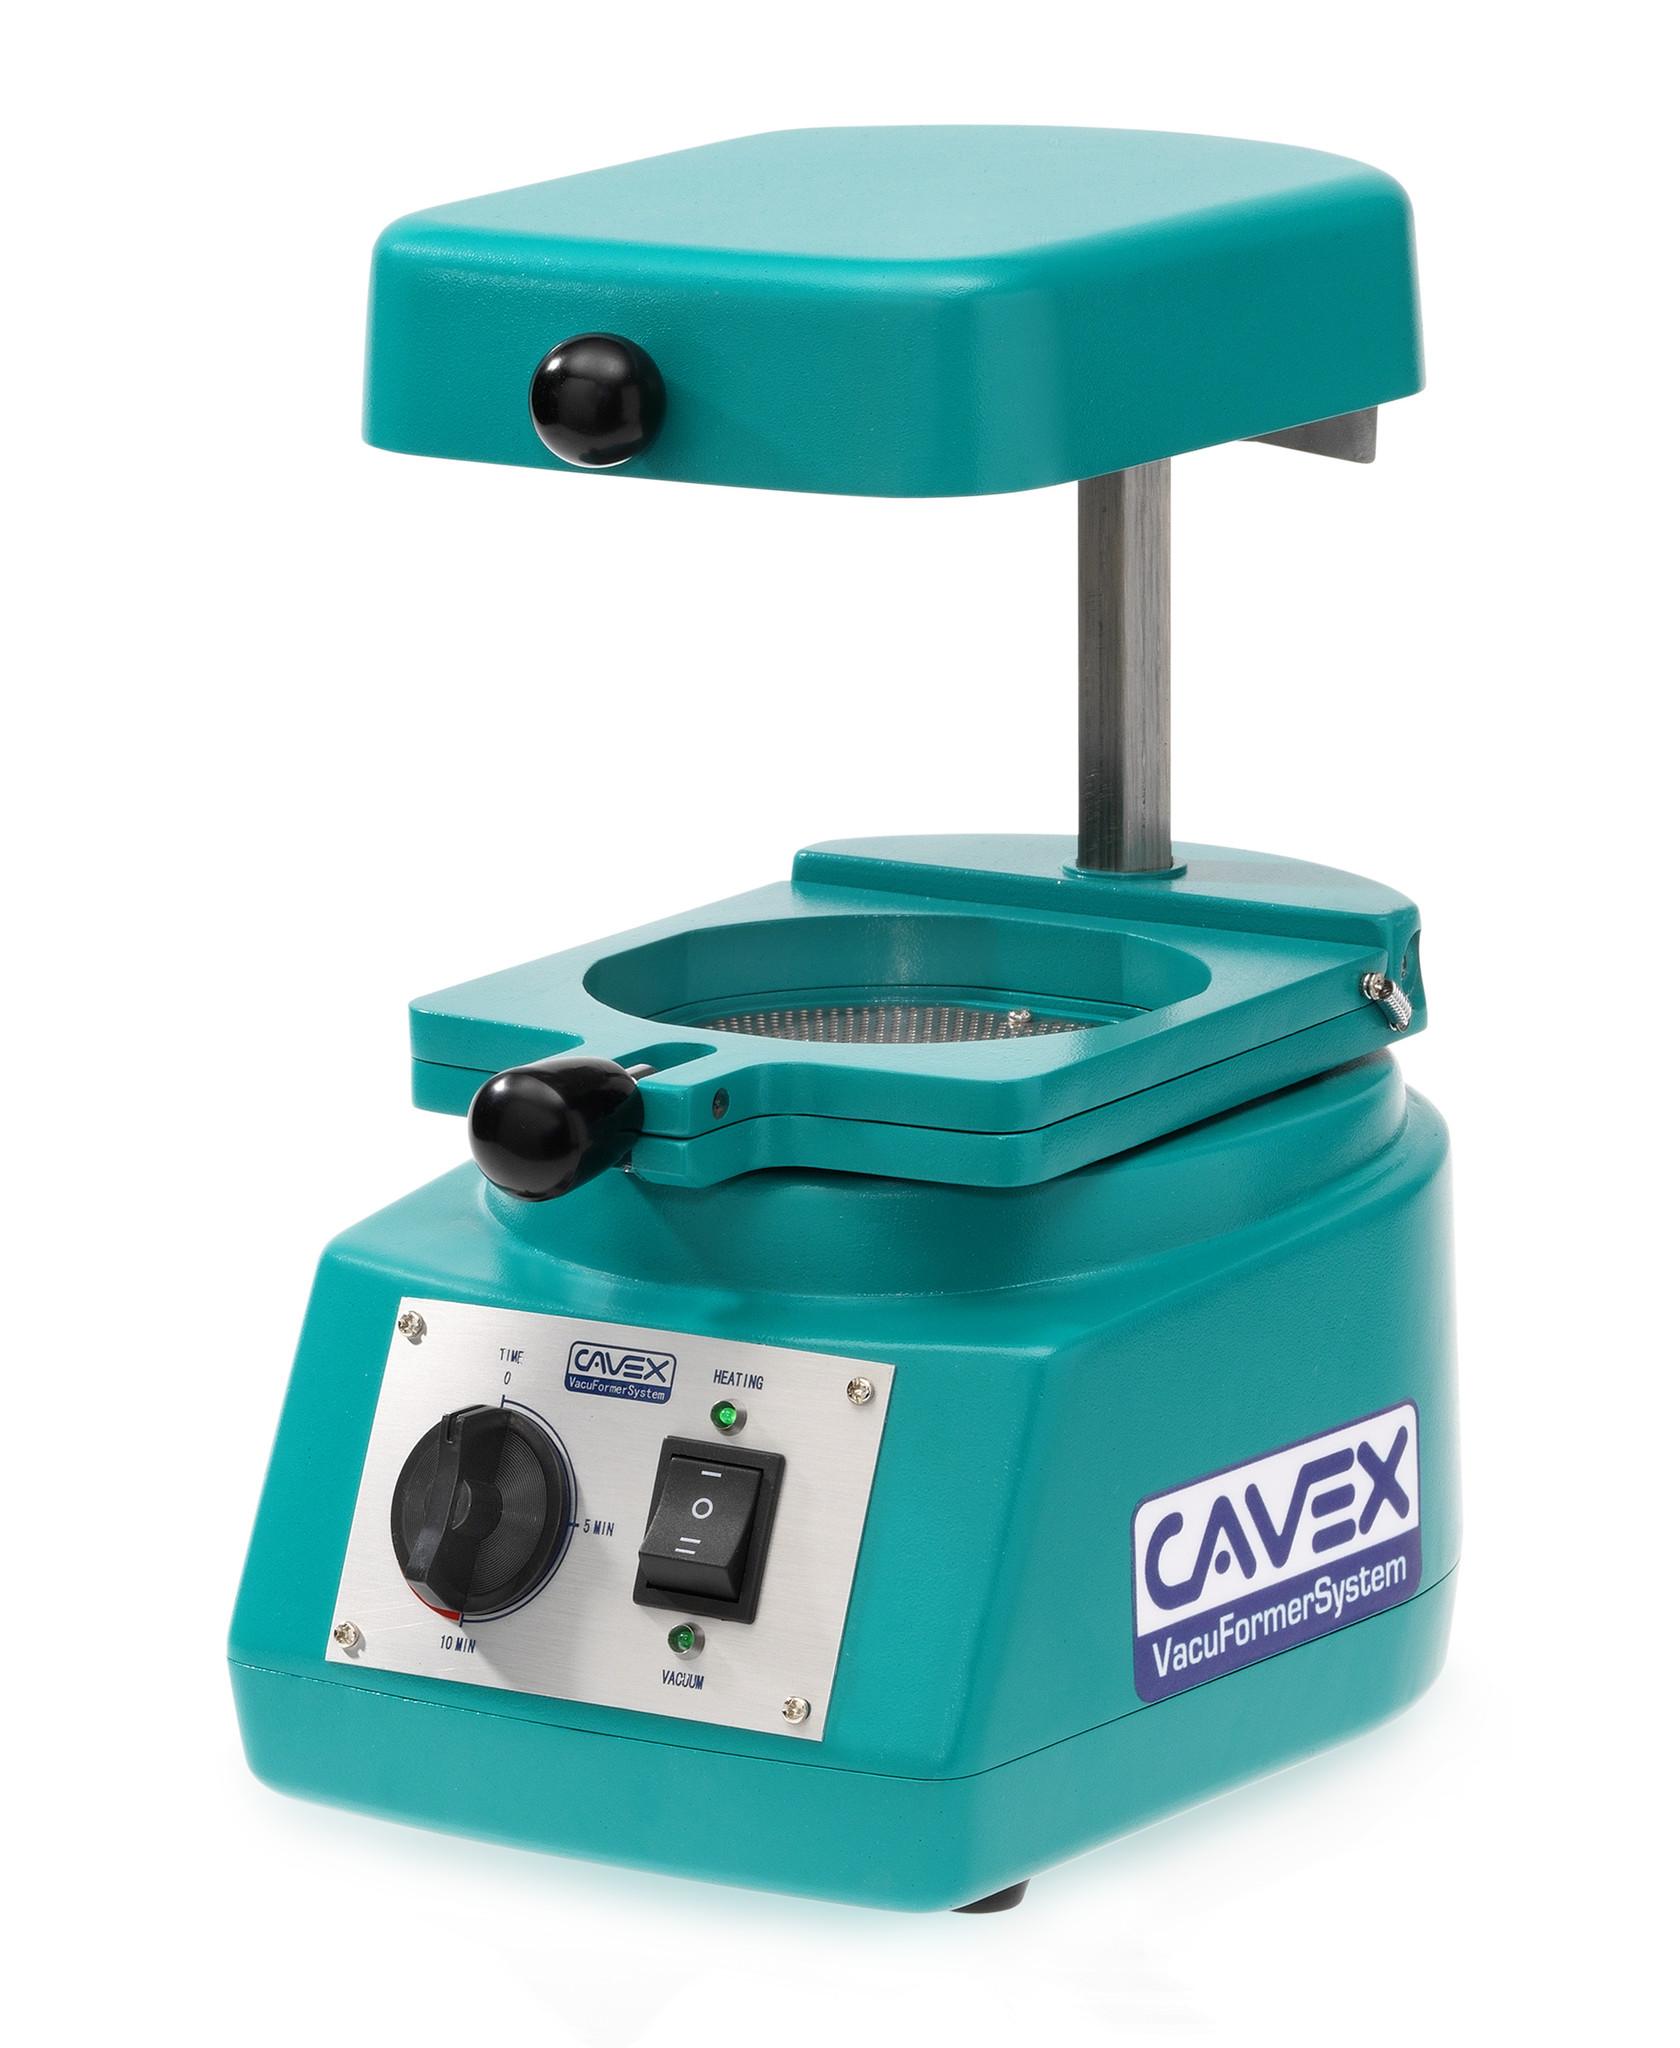 Cavex VacuFormer starterskit + accessoires